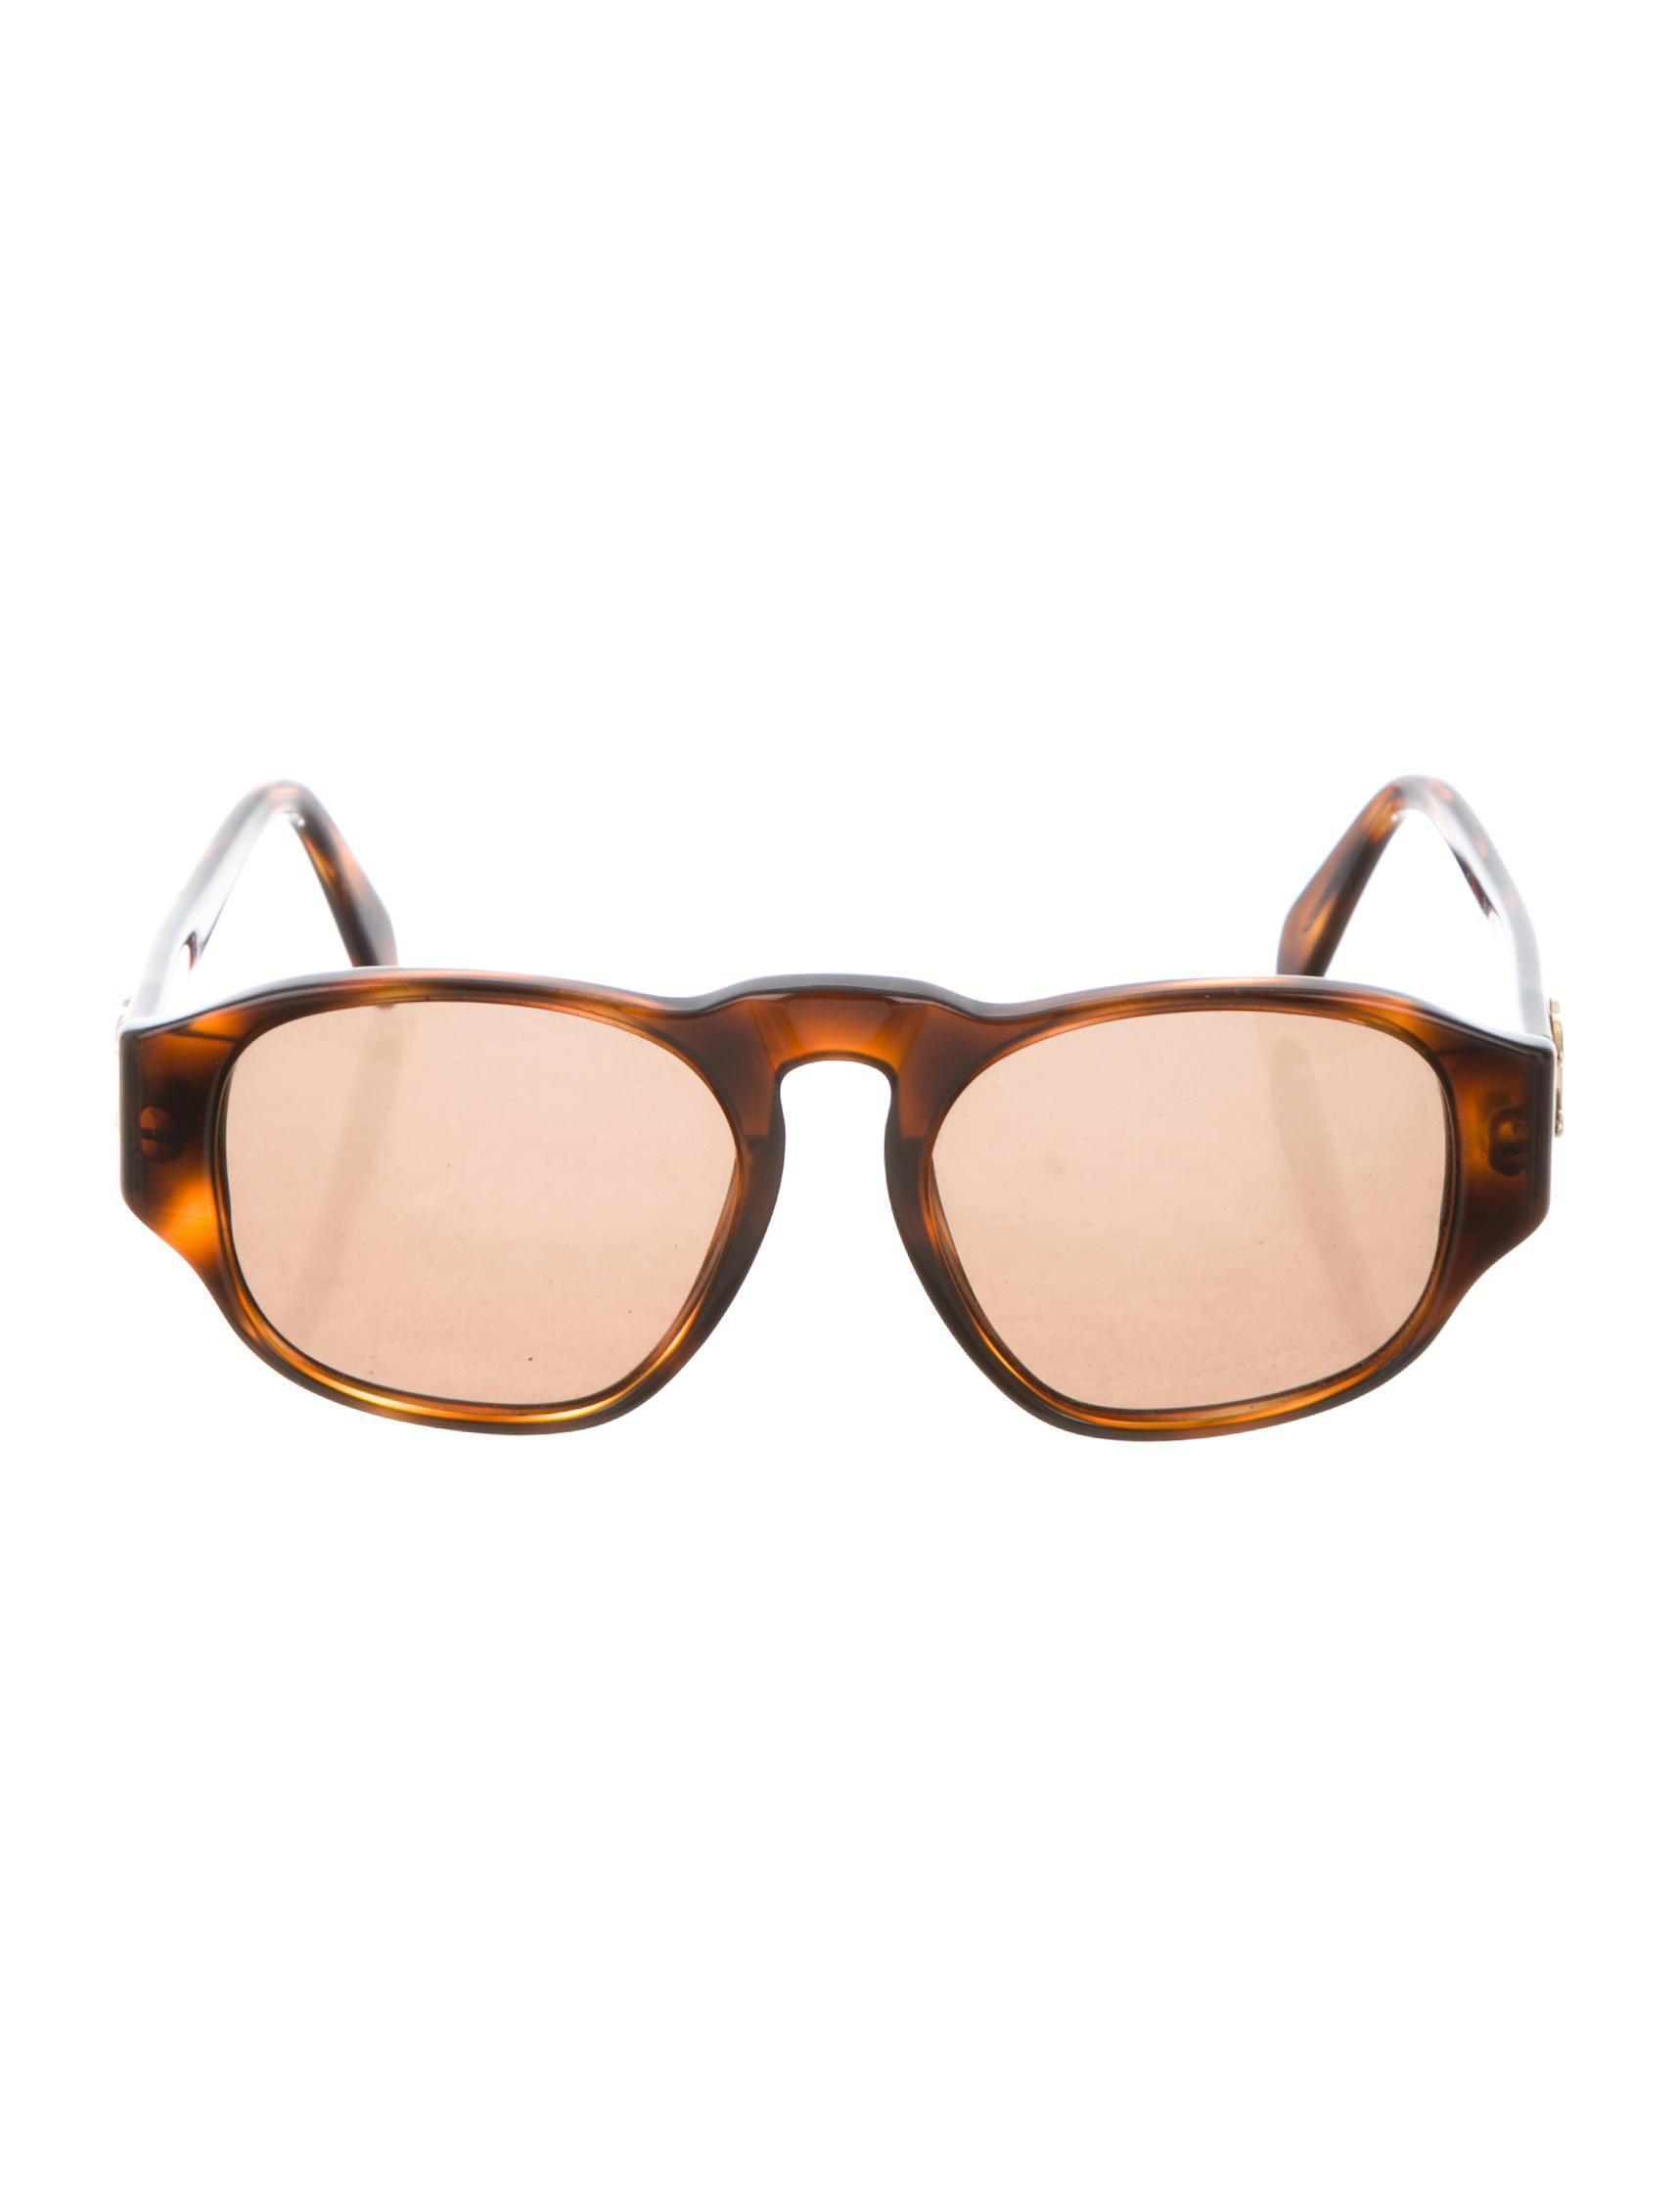 d8ce4fda669 Lyst - Chanel Vintage Cc Sunglasses Brown in Metallic